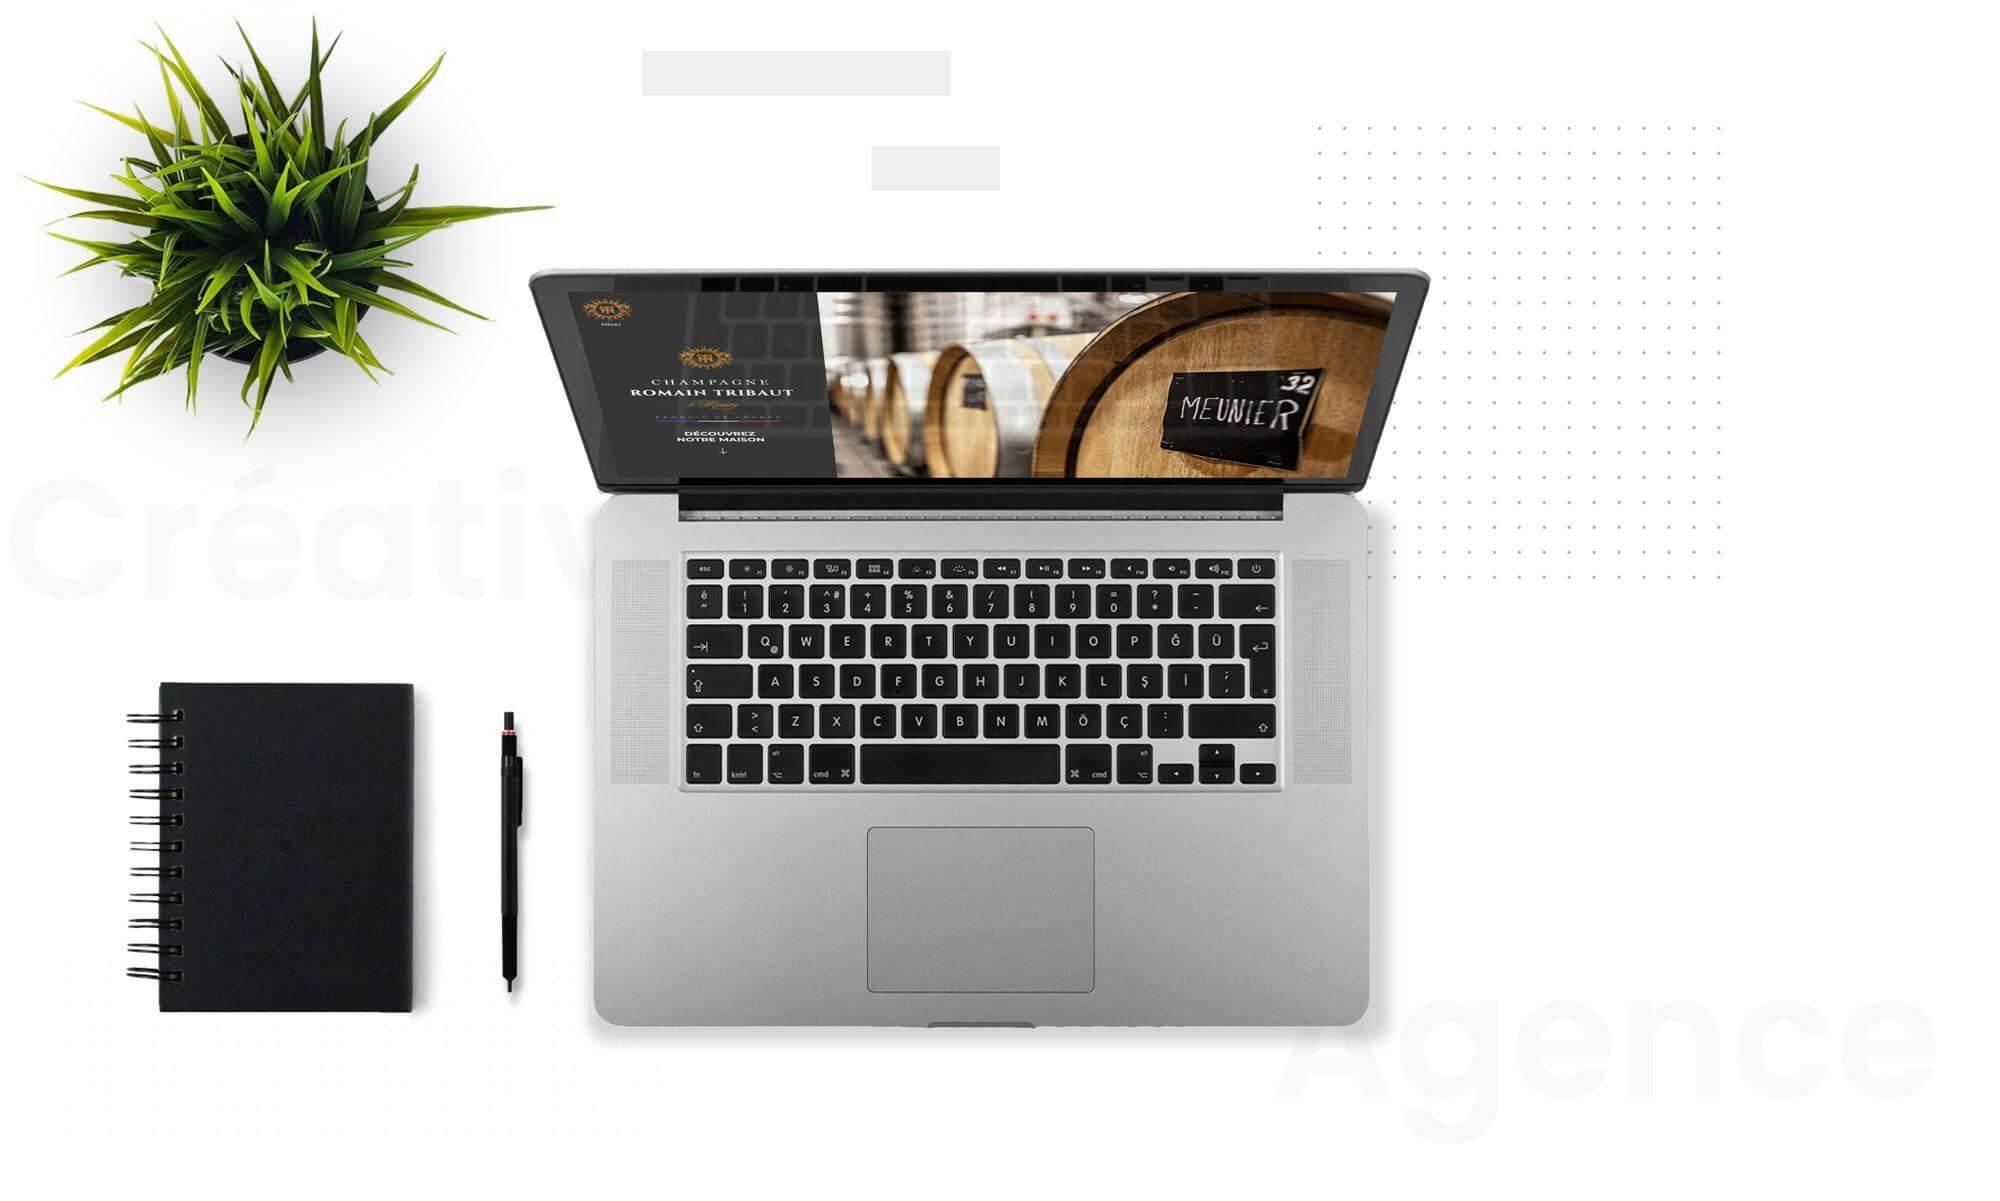 2ca48736f2671084bdb6073aff742b5f Création de site Internet à Reims, Epernay, Paris  ⭐️